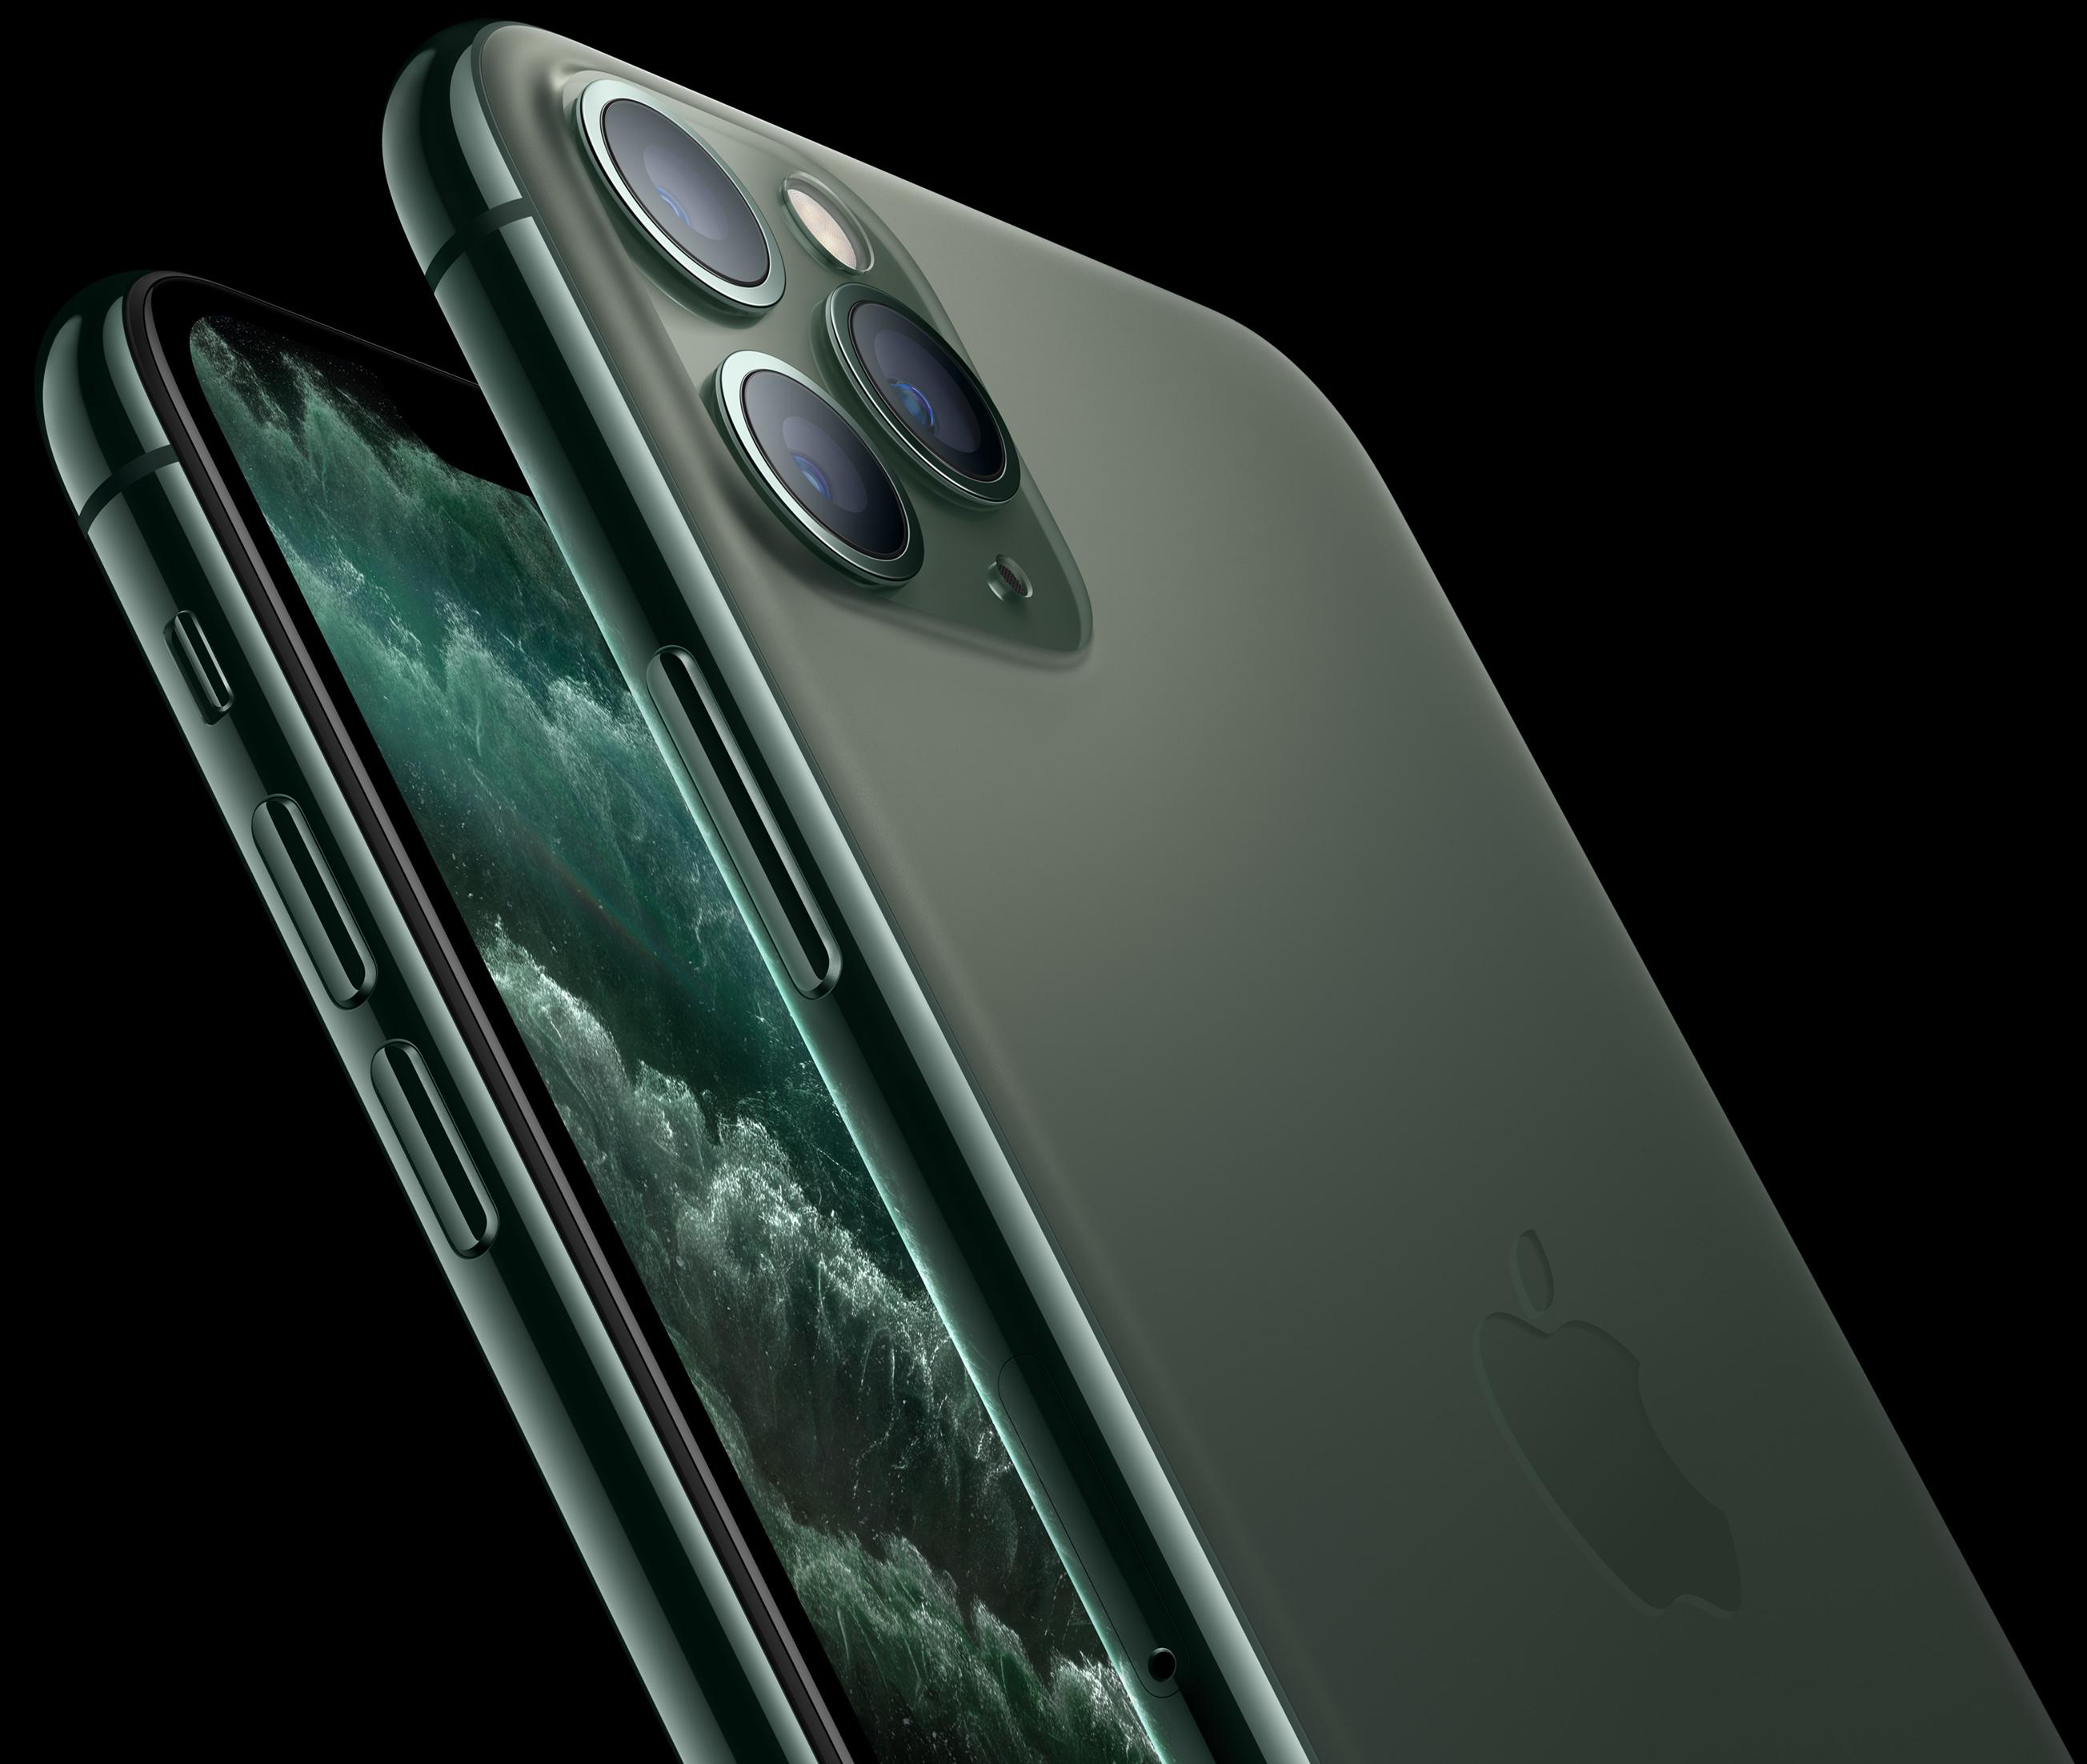 айфон 11 про 256 темно-зеленый